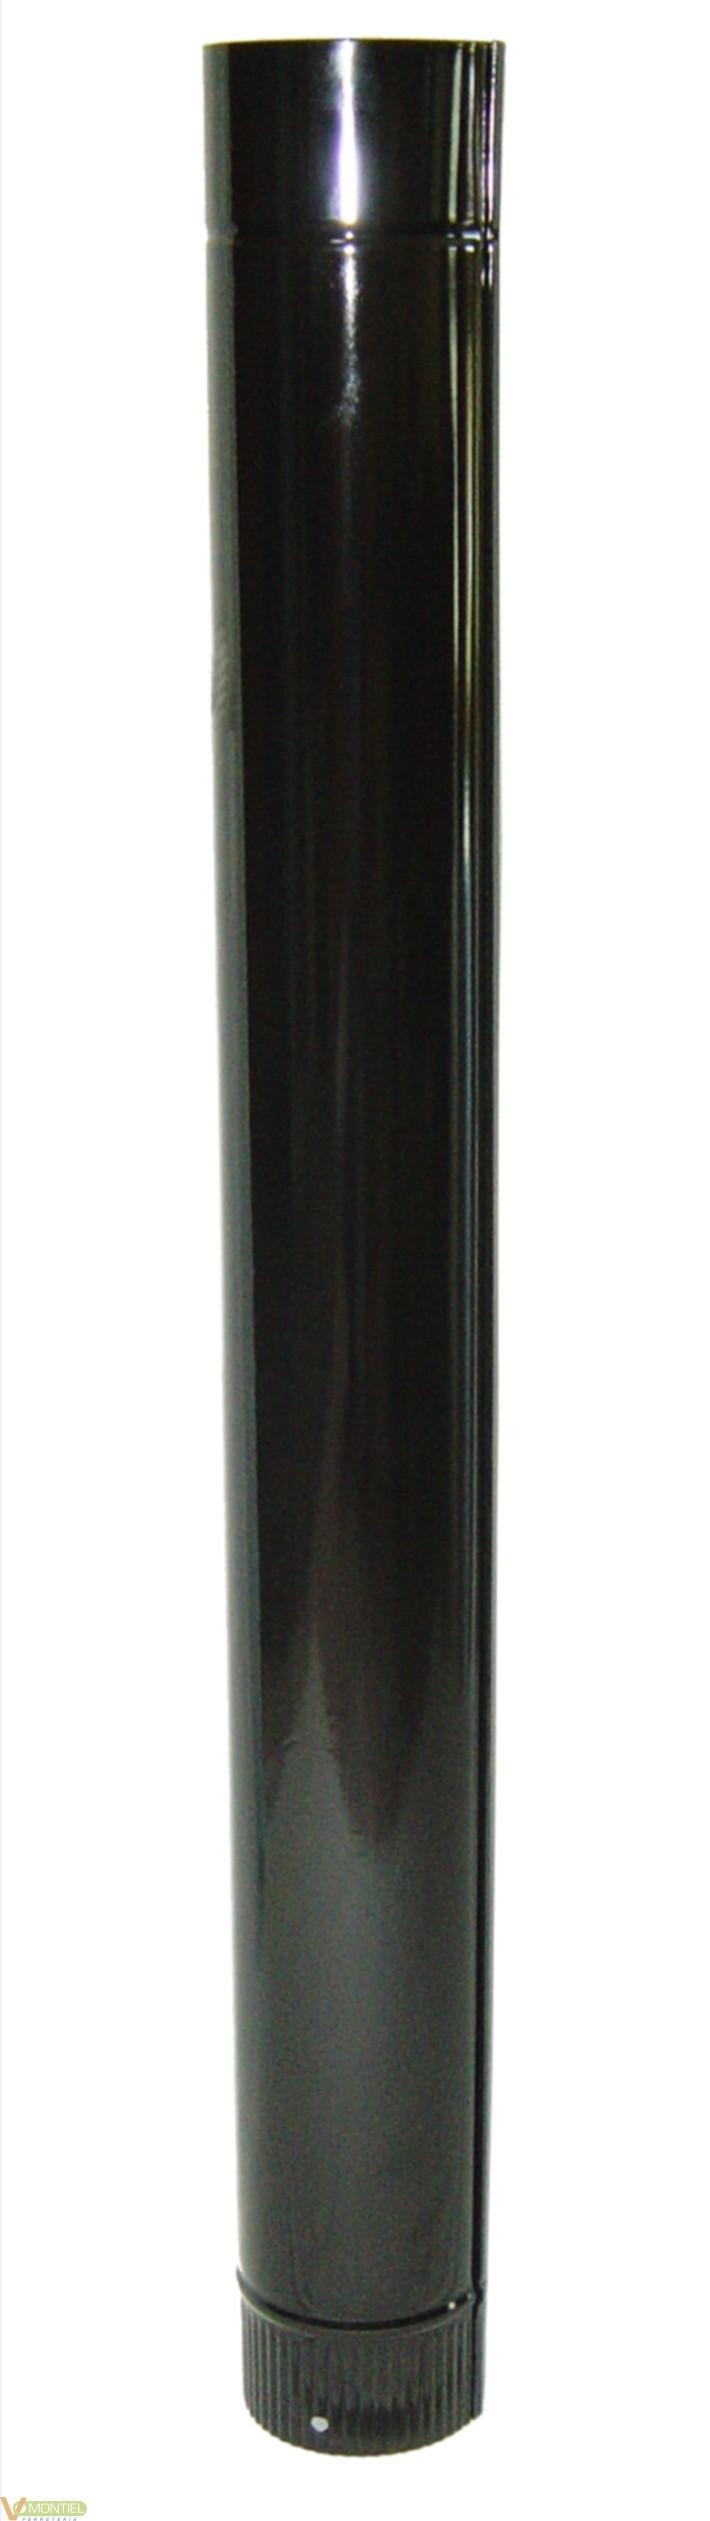 Tubo estufa  110mm a/esm-0